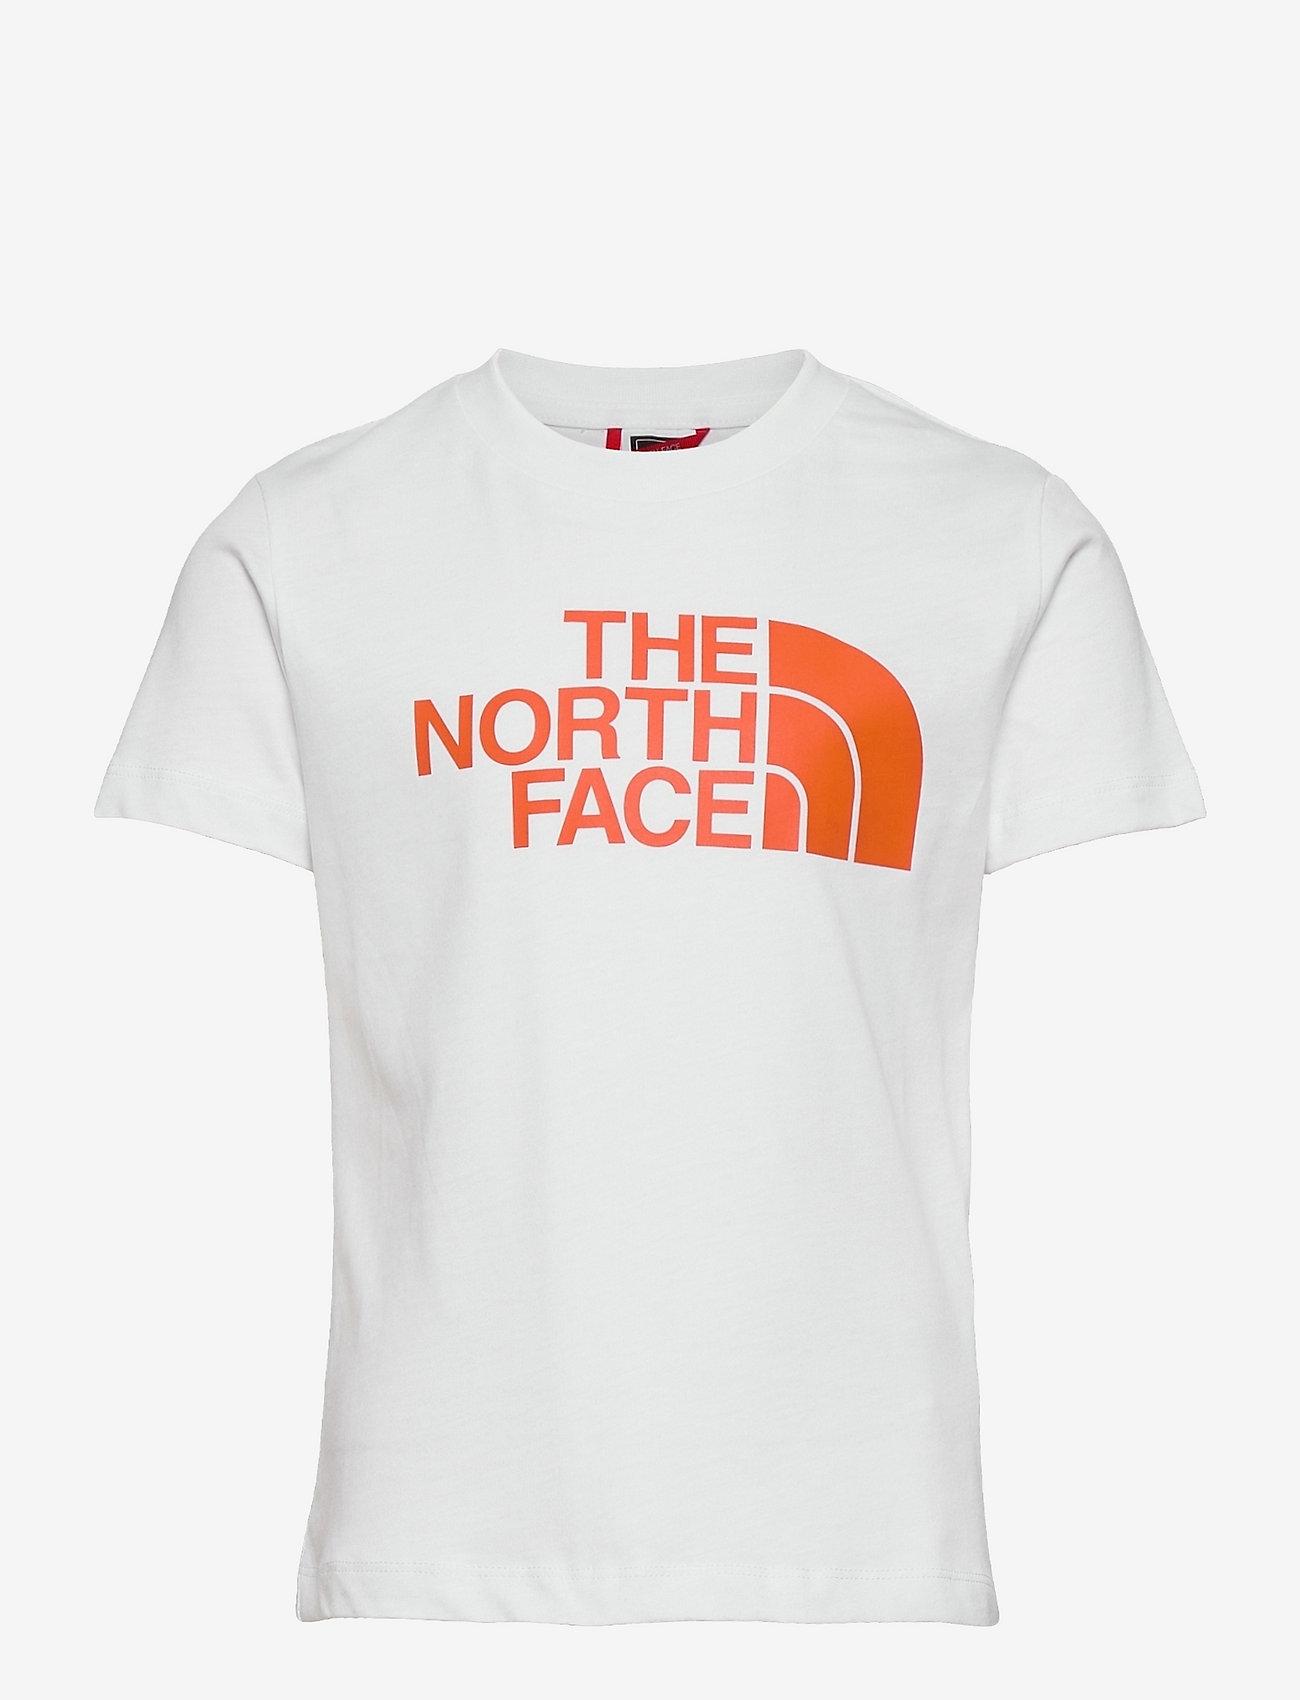 The North Face - Y S/S EASY TEE - korte mouwen - tnfwht/redorang - 0